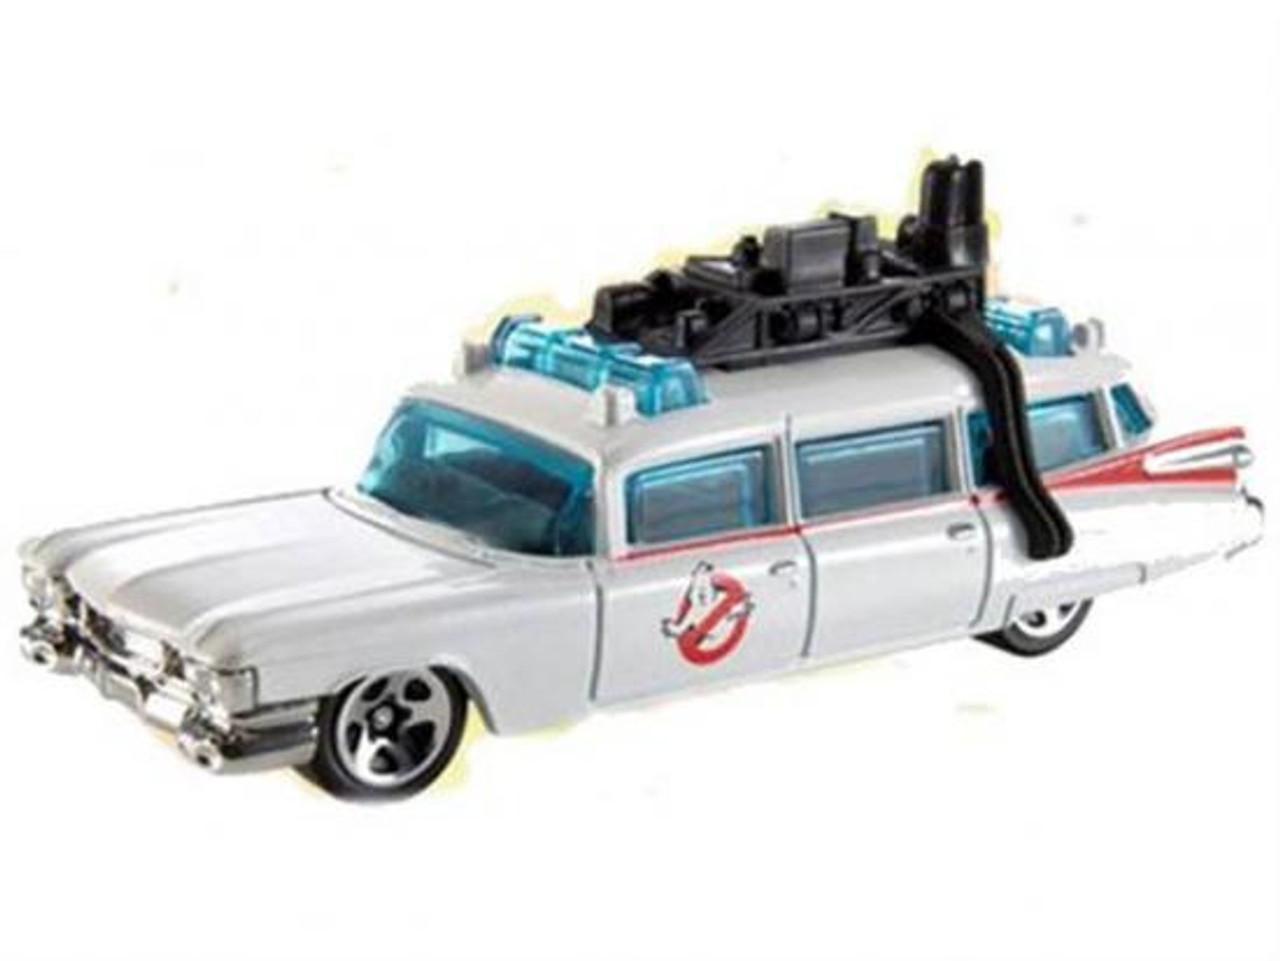 Ghostbusters Hot Wheels Elite Ecto 1 Diecast Vehicle